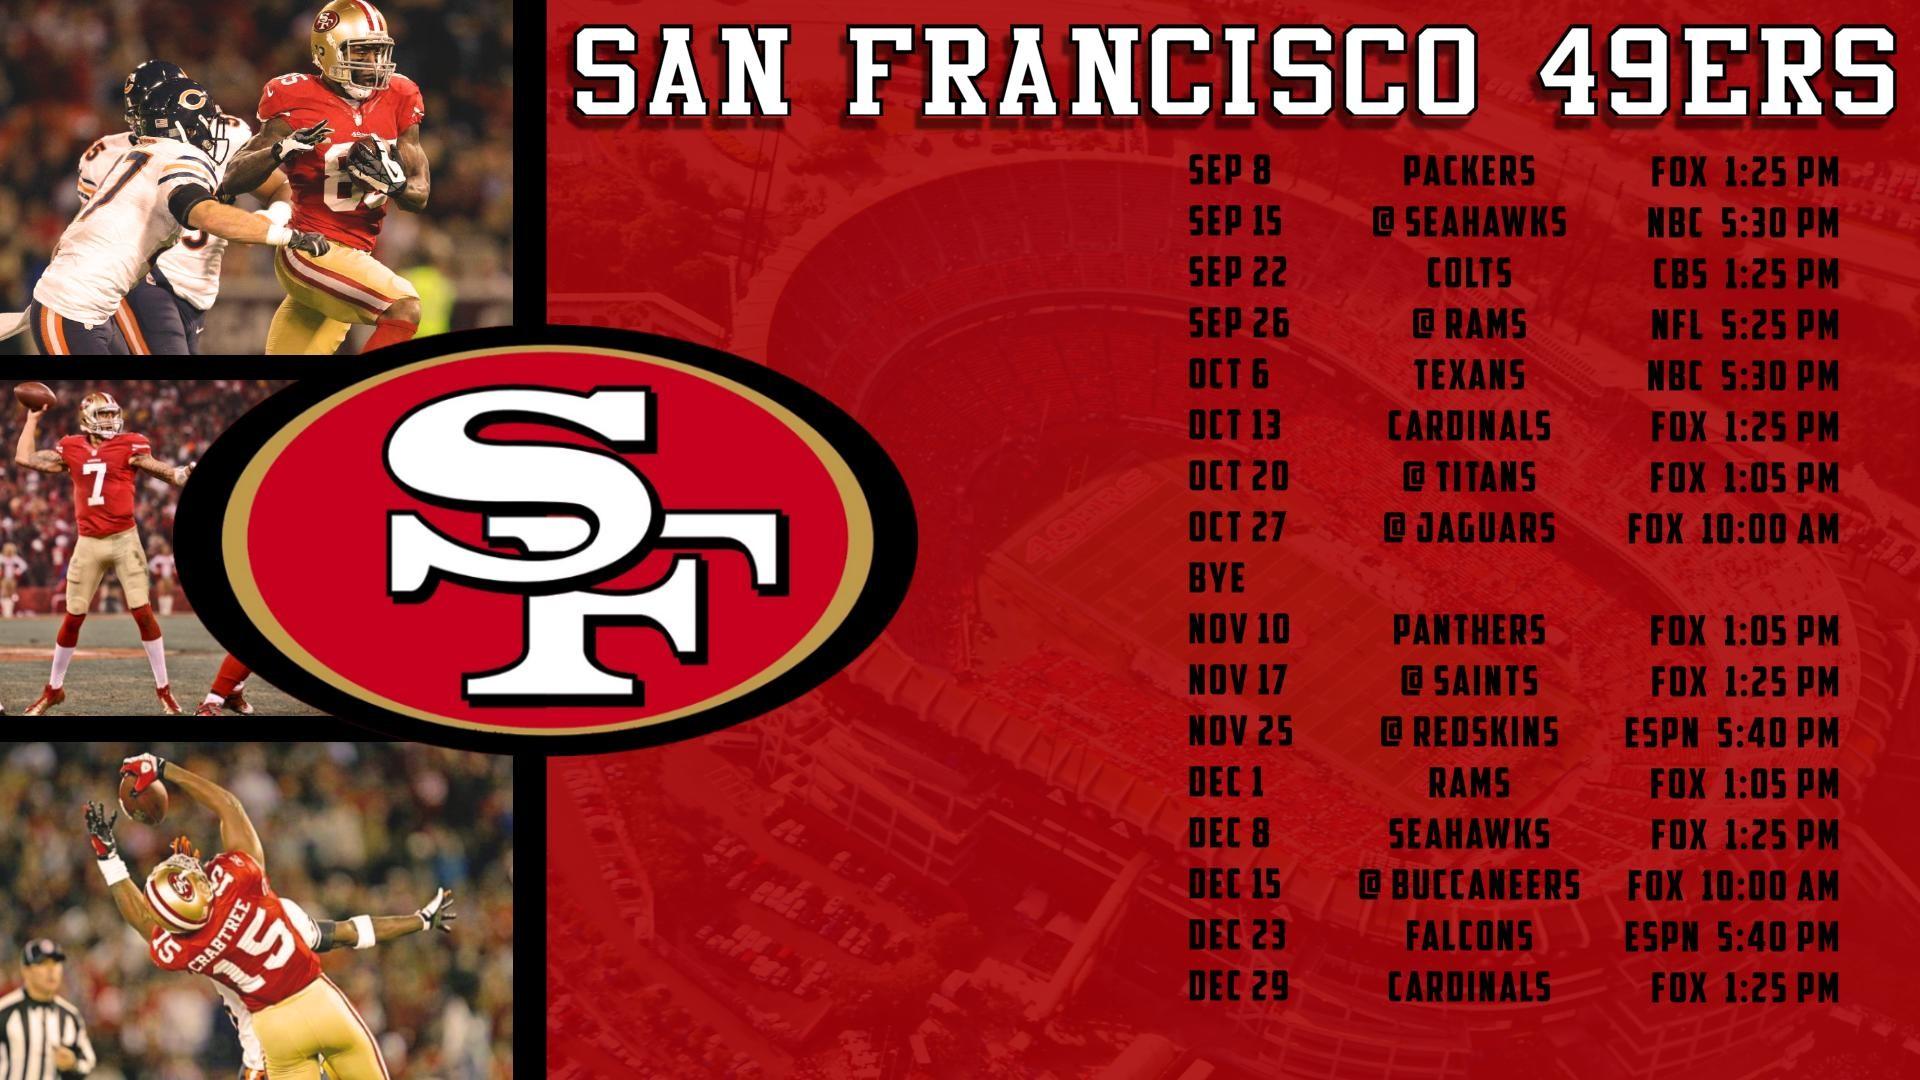 1920x1080 San Francisco 49ers Wallpapers 2015 - Wallpaper Cave 0 HTML code. Sun, 29